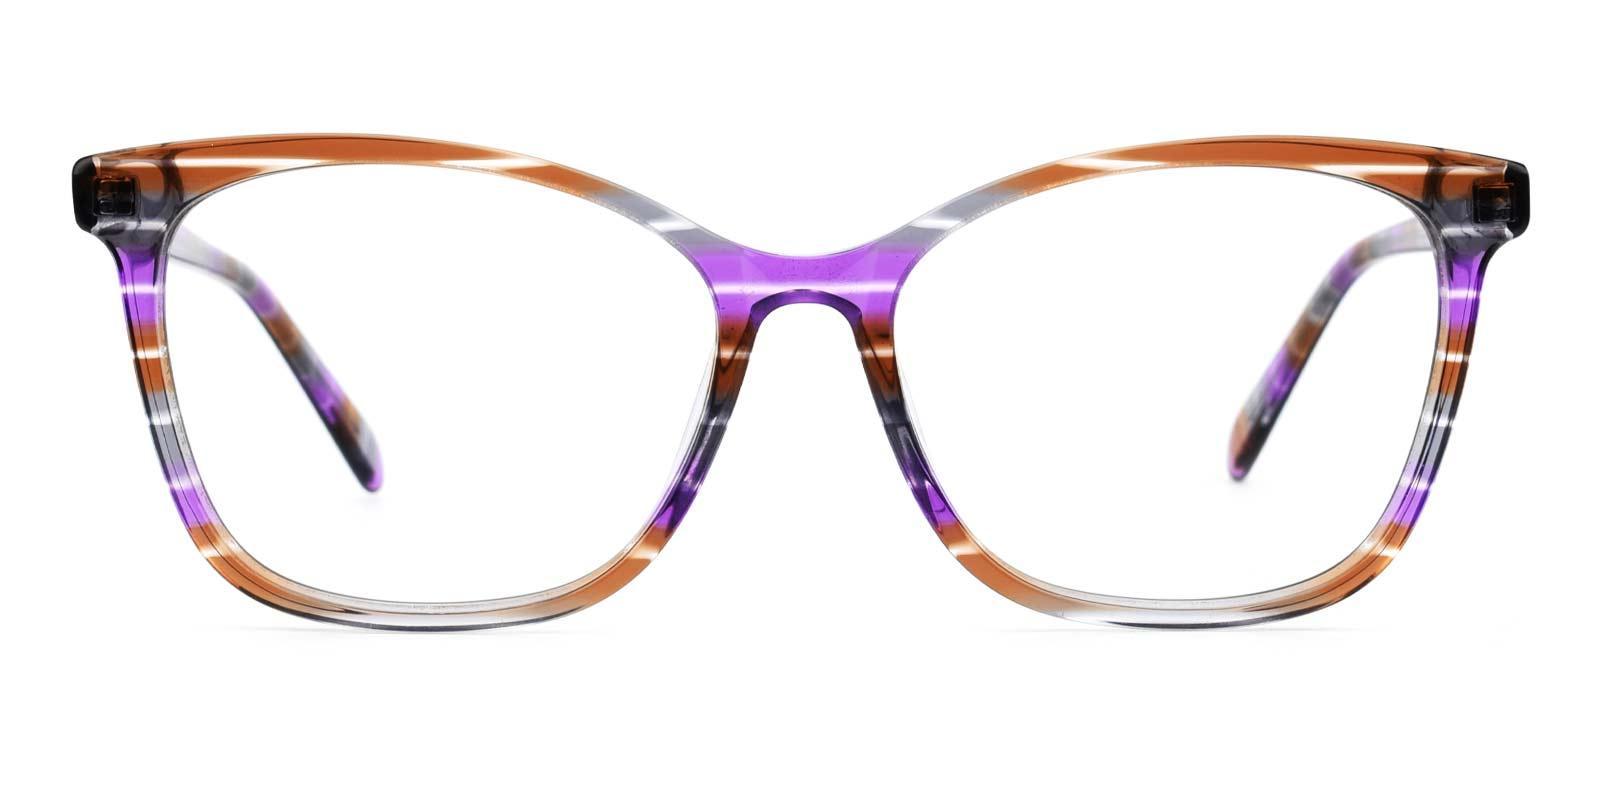 Poppy-Purple-Square-Acetate-Eyeglasses-detail